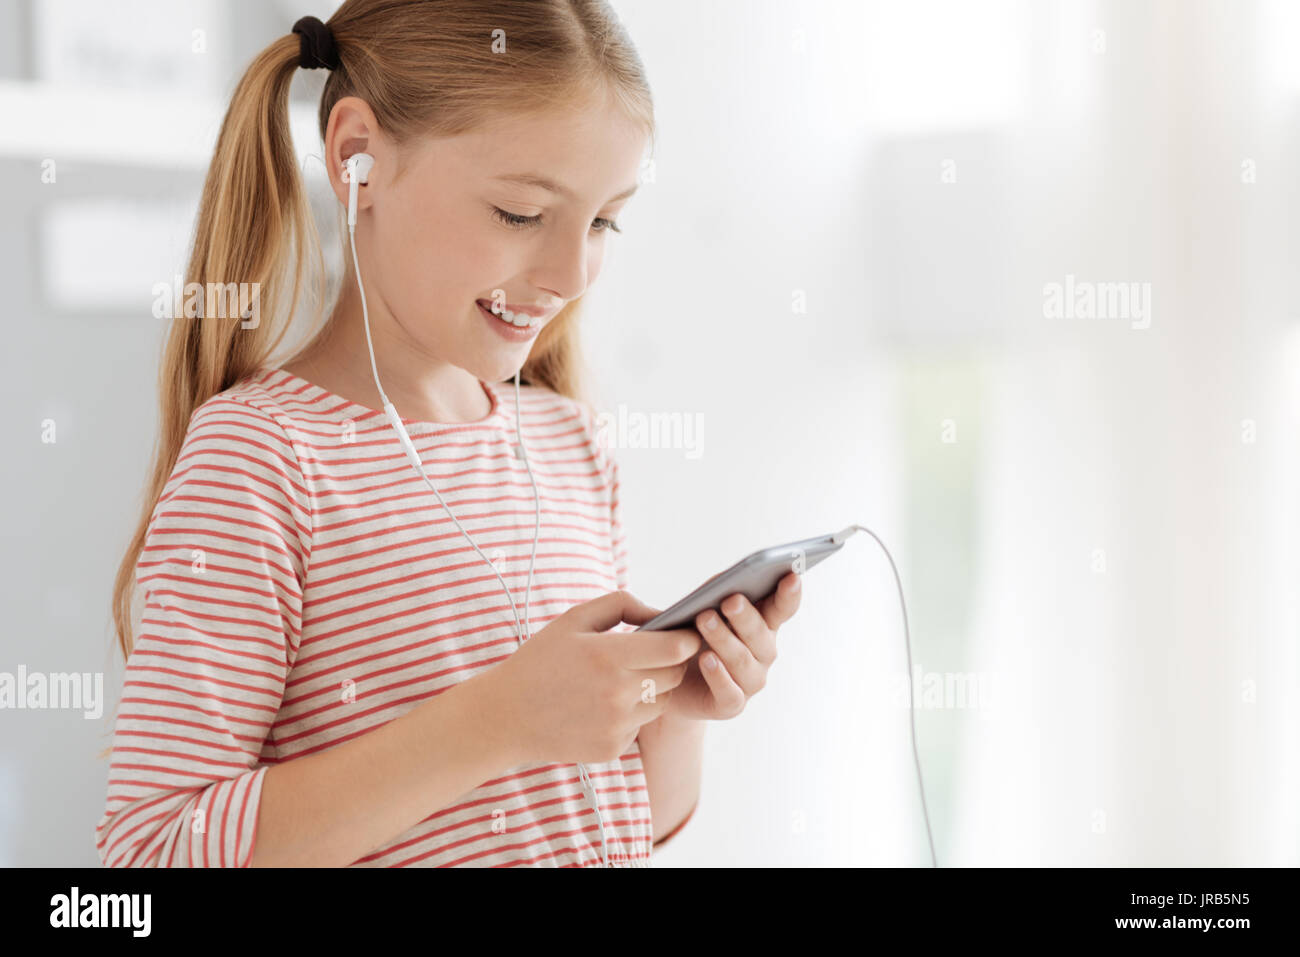 Pensamiento positivo escuchar música infantil Imagen De Stock